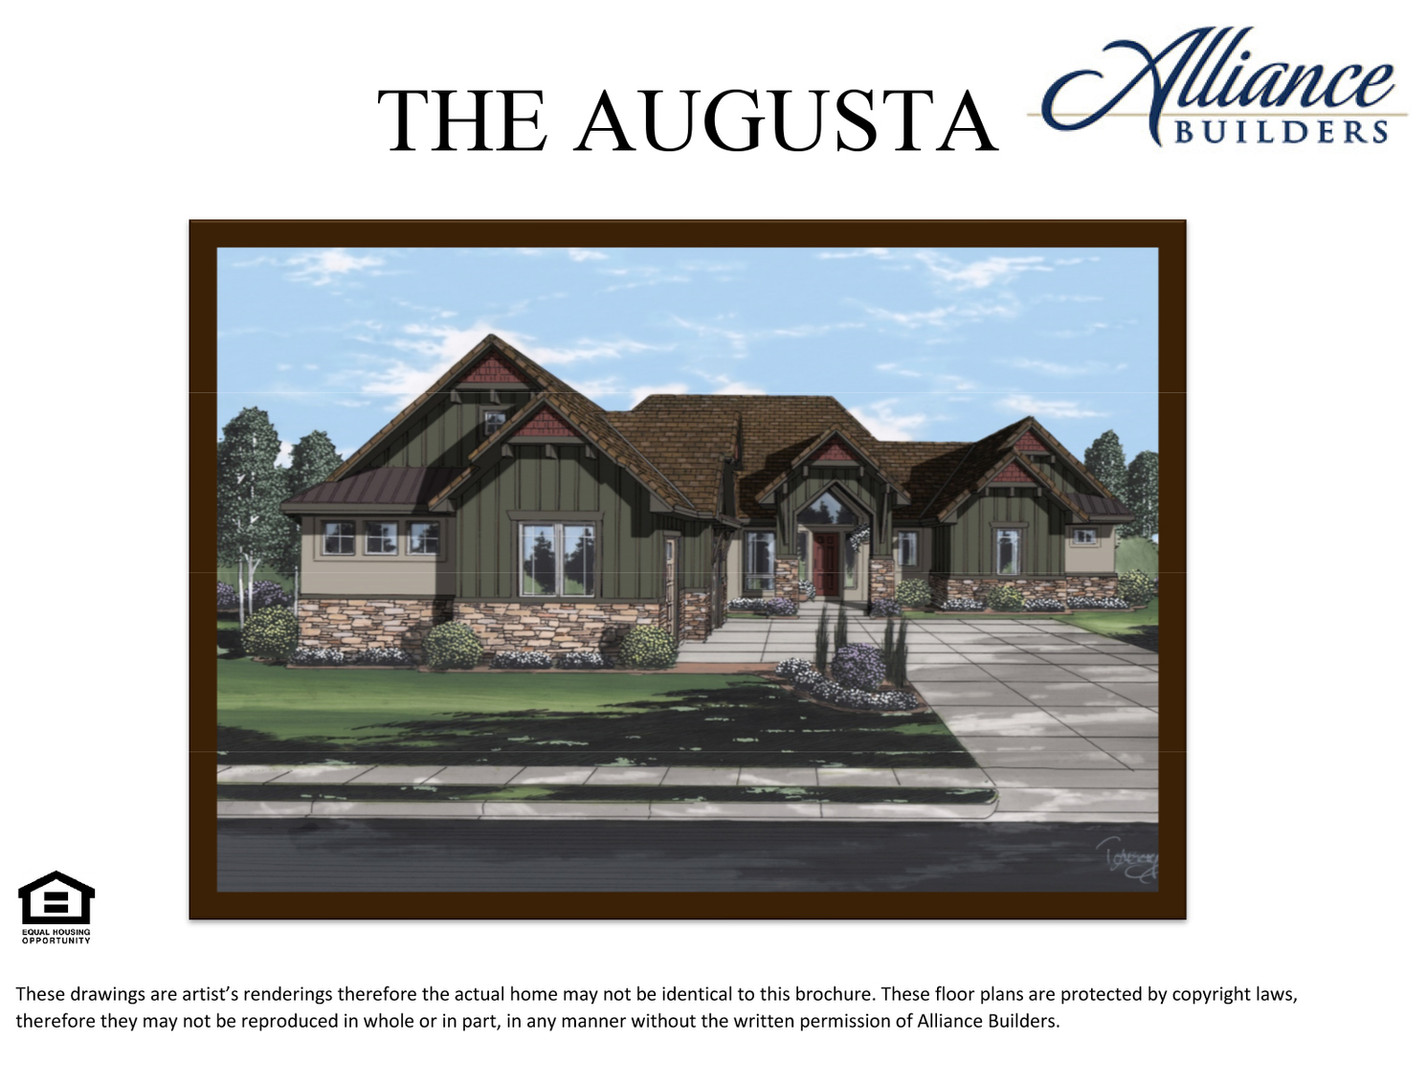 The Augusta